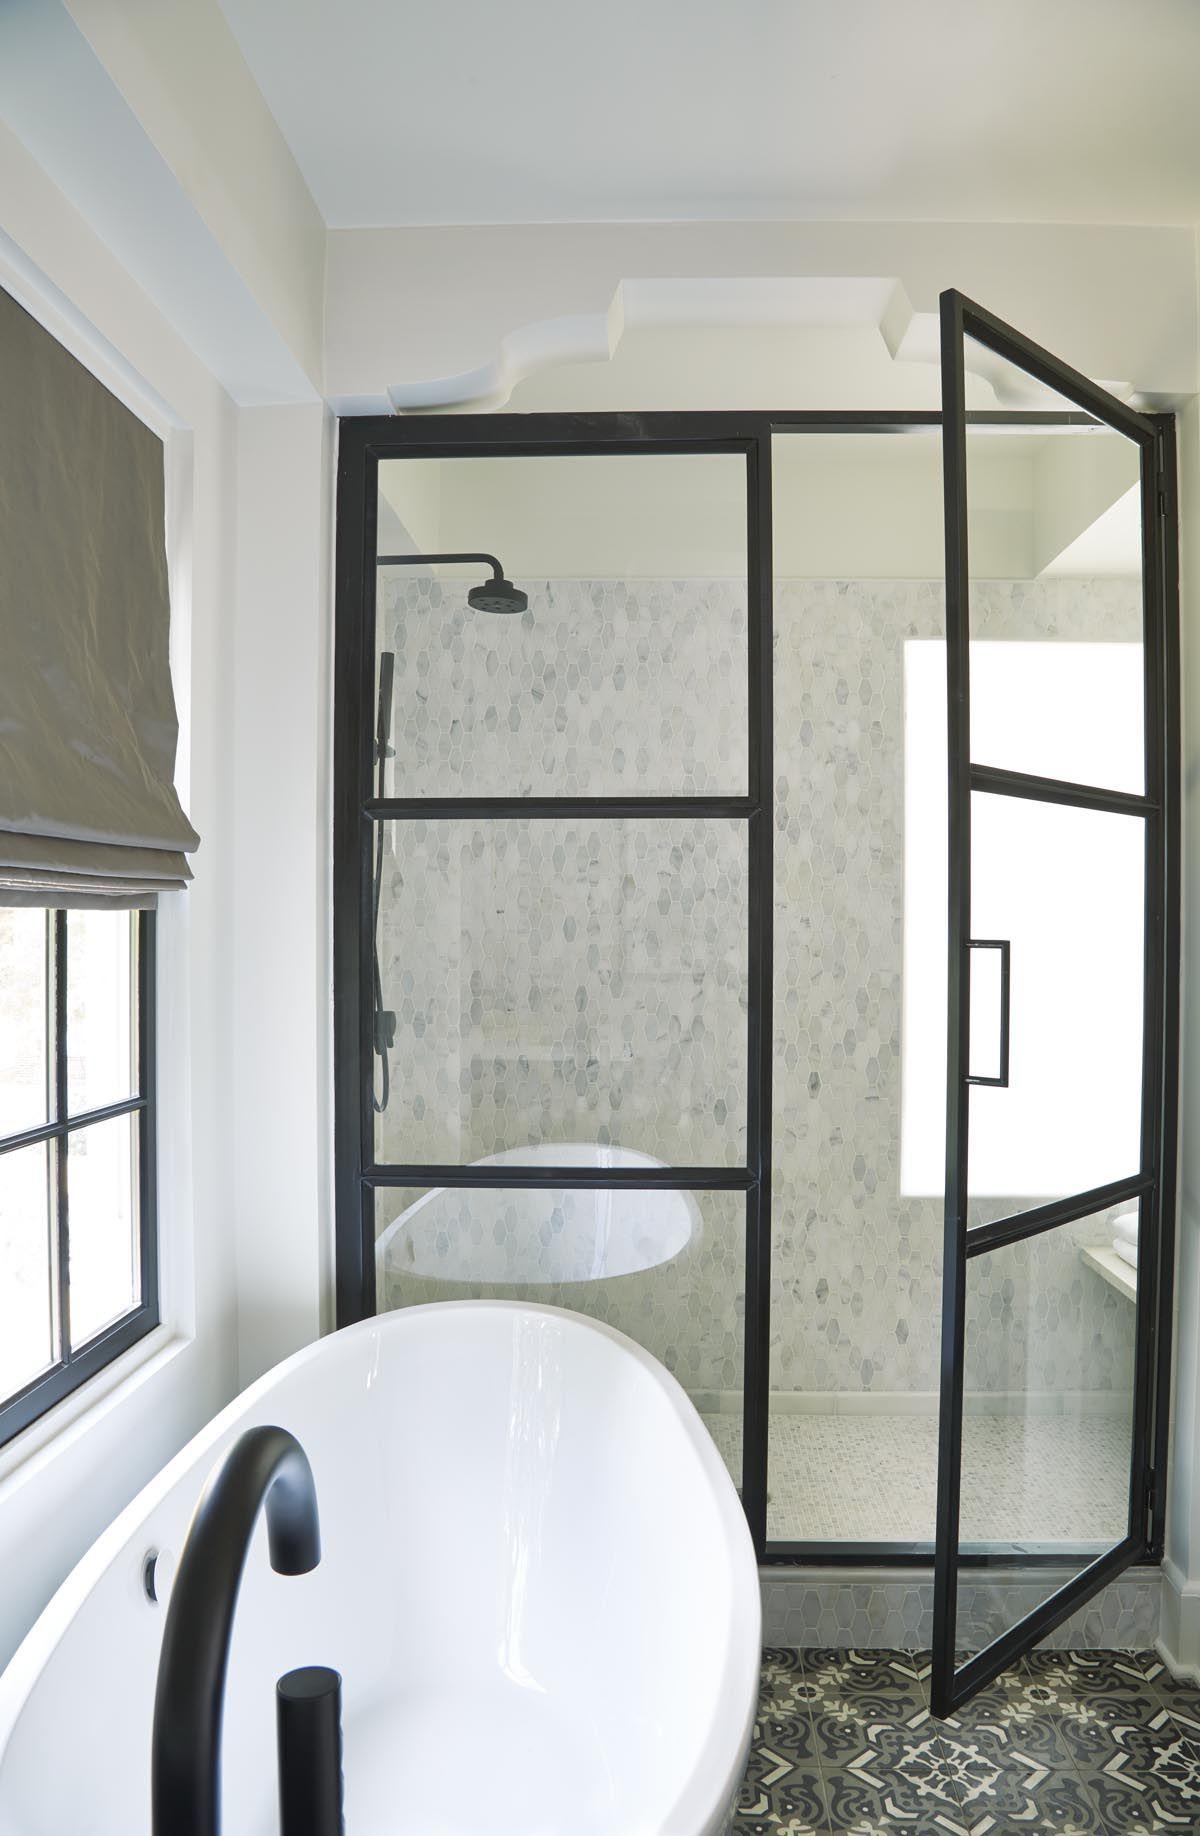 Atlanta Magazine, Atlanta Magazines Home, And Beverly Baribault Design Group